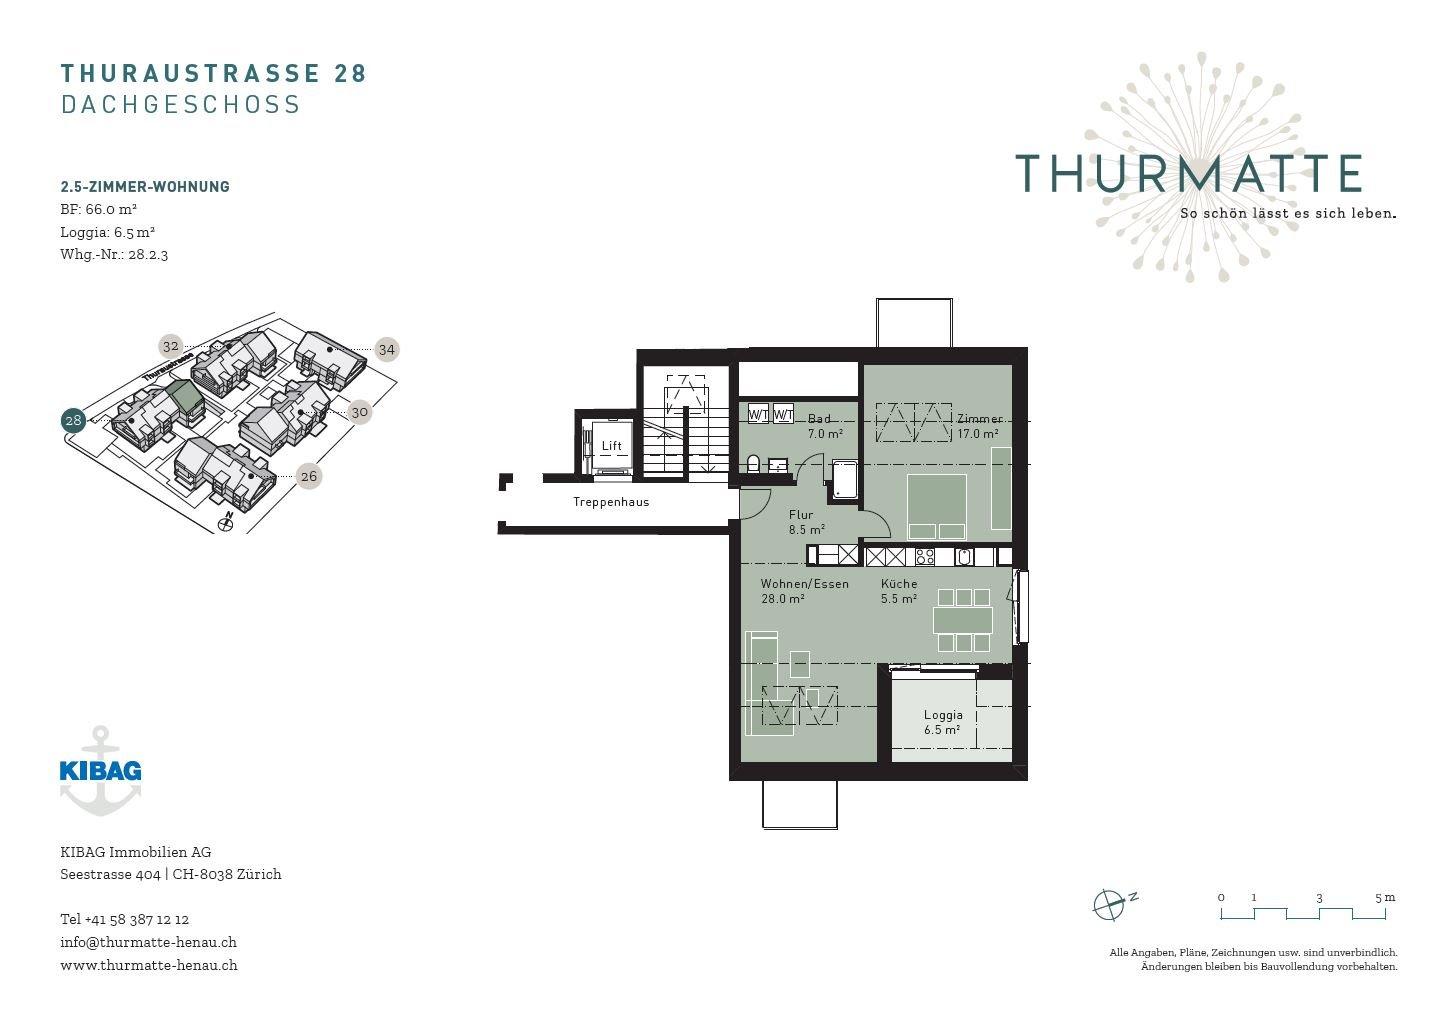 Thuraustrasse 28